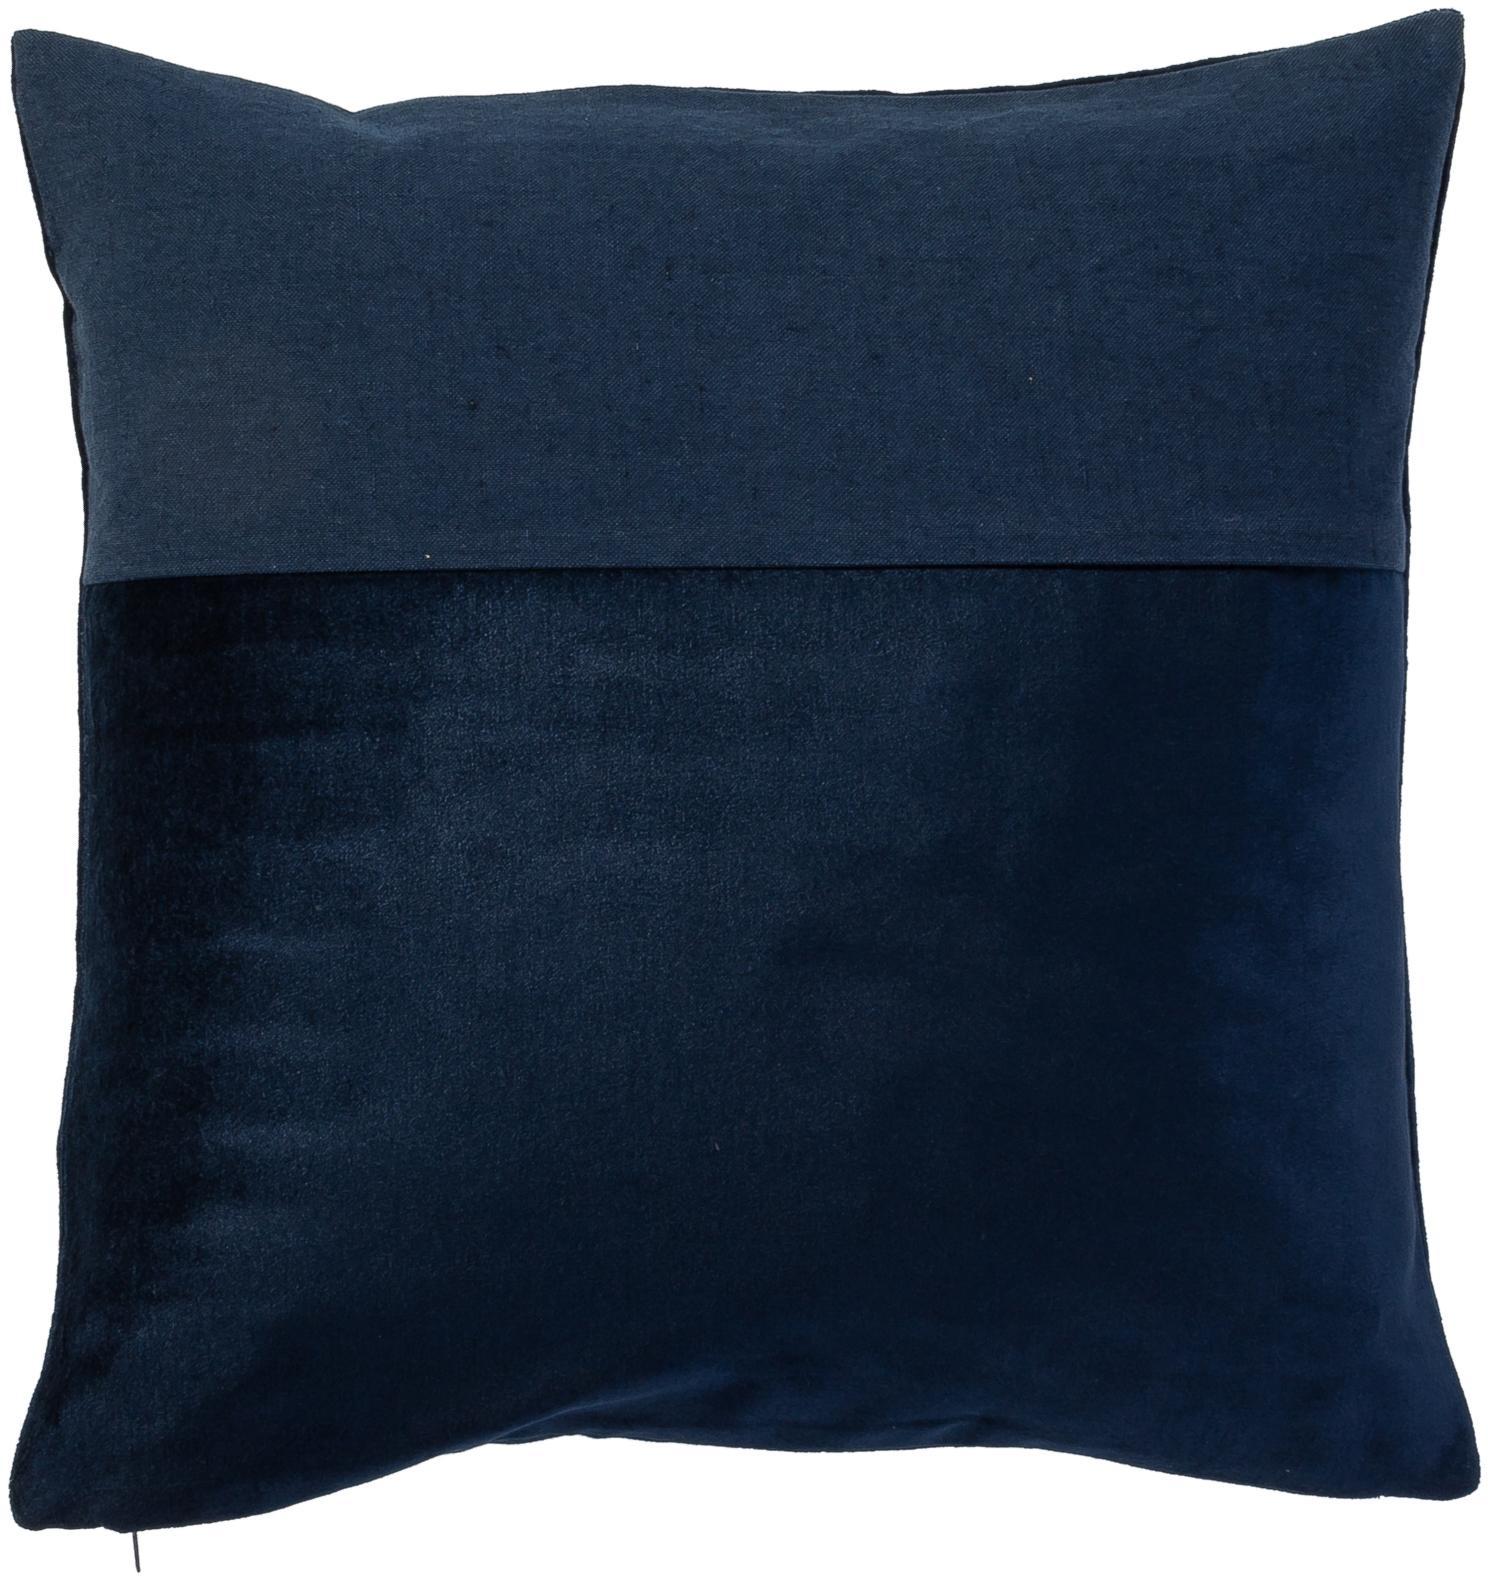 Funda de cojín de terciopelo y lino Adelaide, Parte delantera: 50%algodón, 50%lino, Azul oscuro, An 40 x L 40 cm